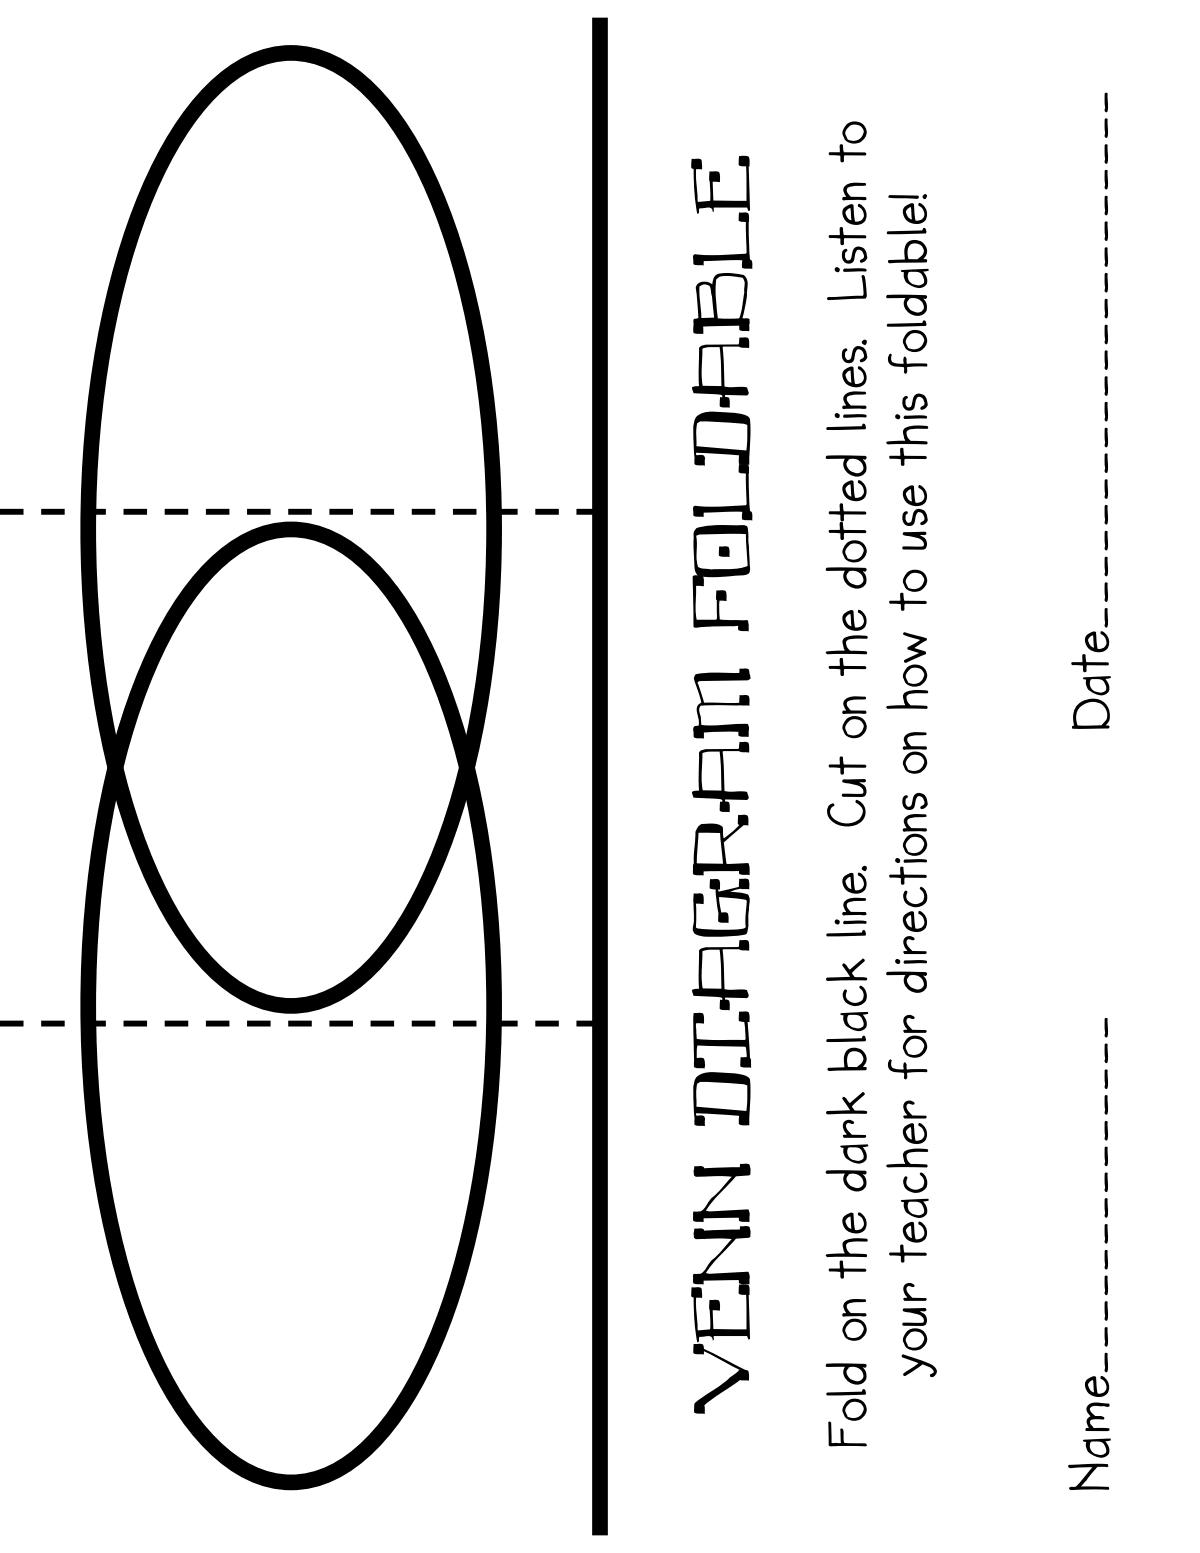 Foldable Venn Diagram